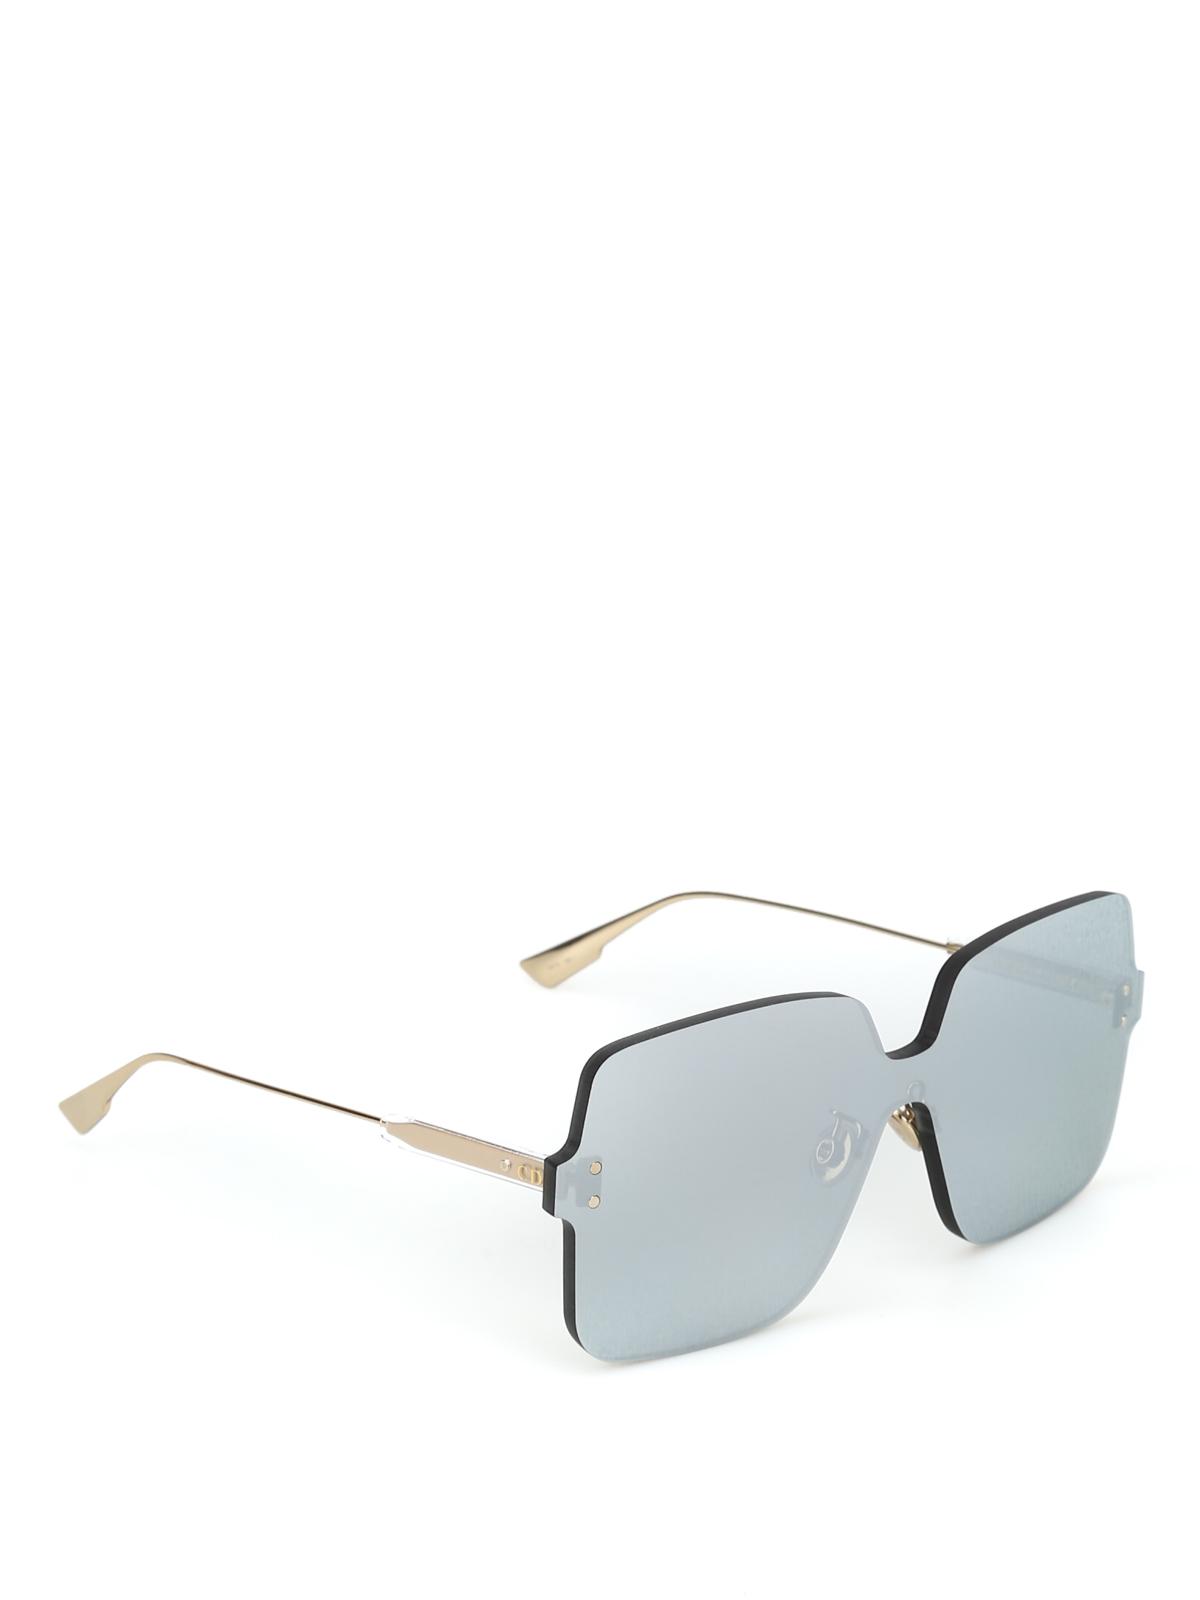 4671b80ccfcac Dior - DiorColorQuake1 over sunglasses - sunglasses ...